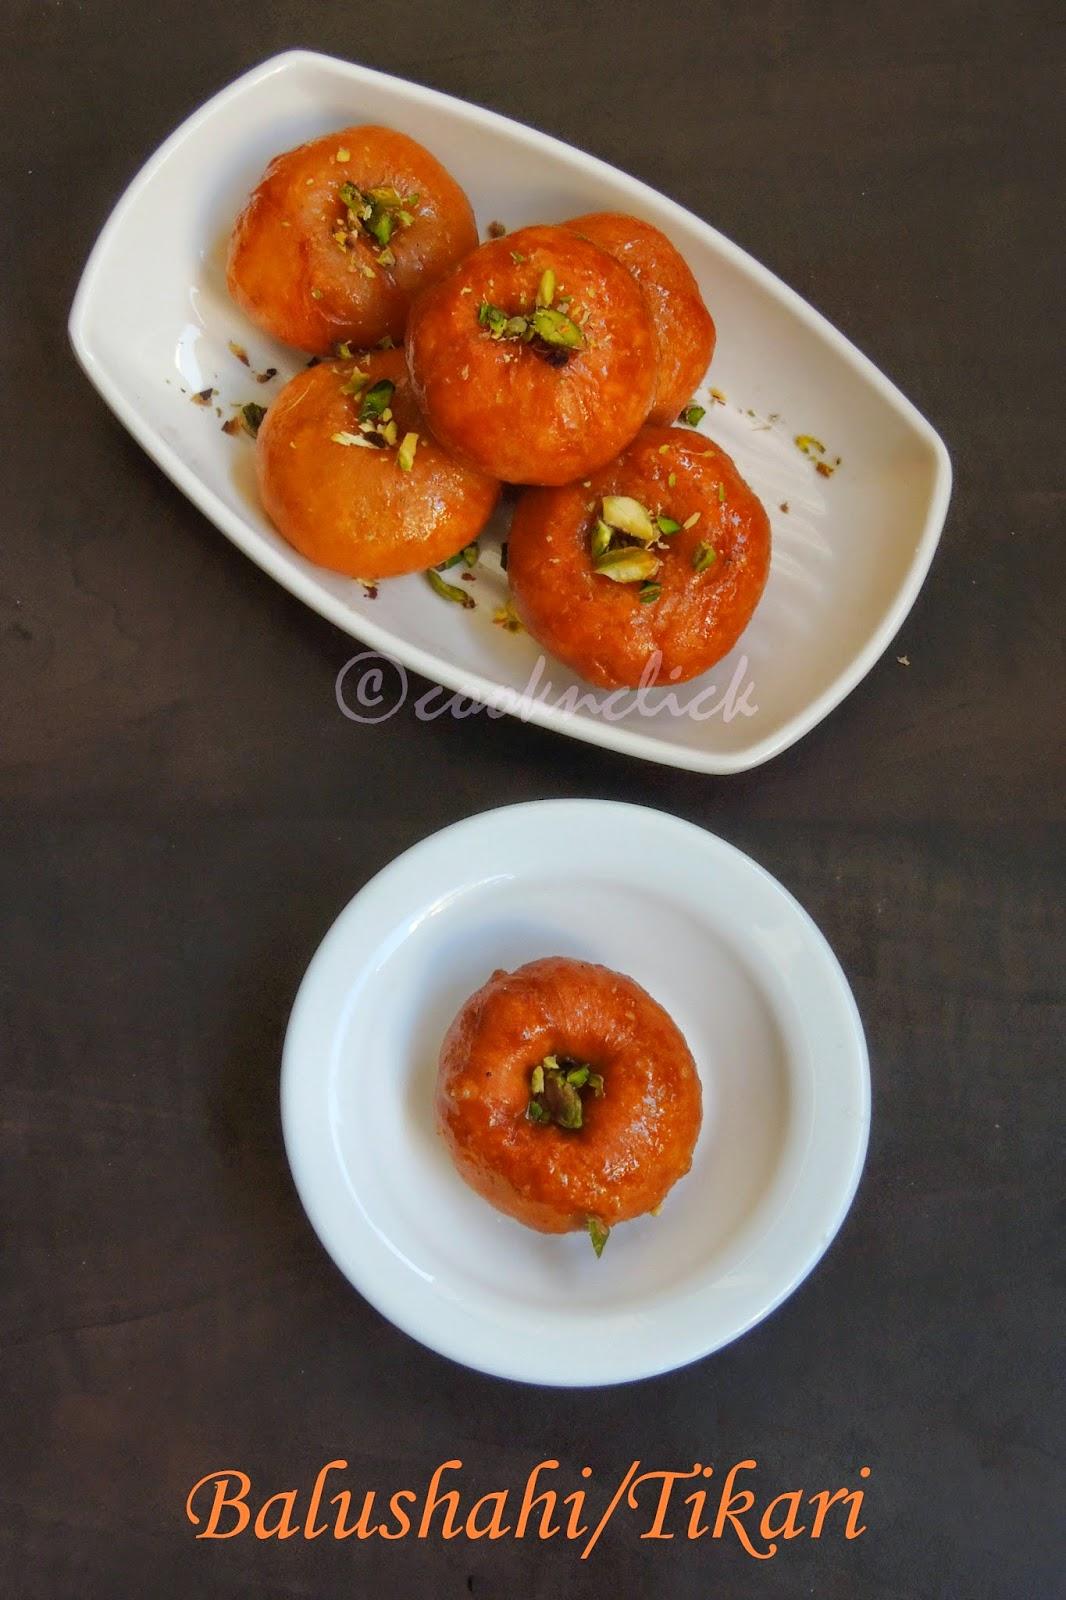 Balushahi, North Indian Badusha, Tikari, Indian Doughnuts